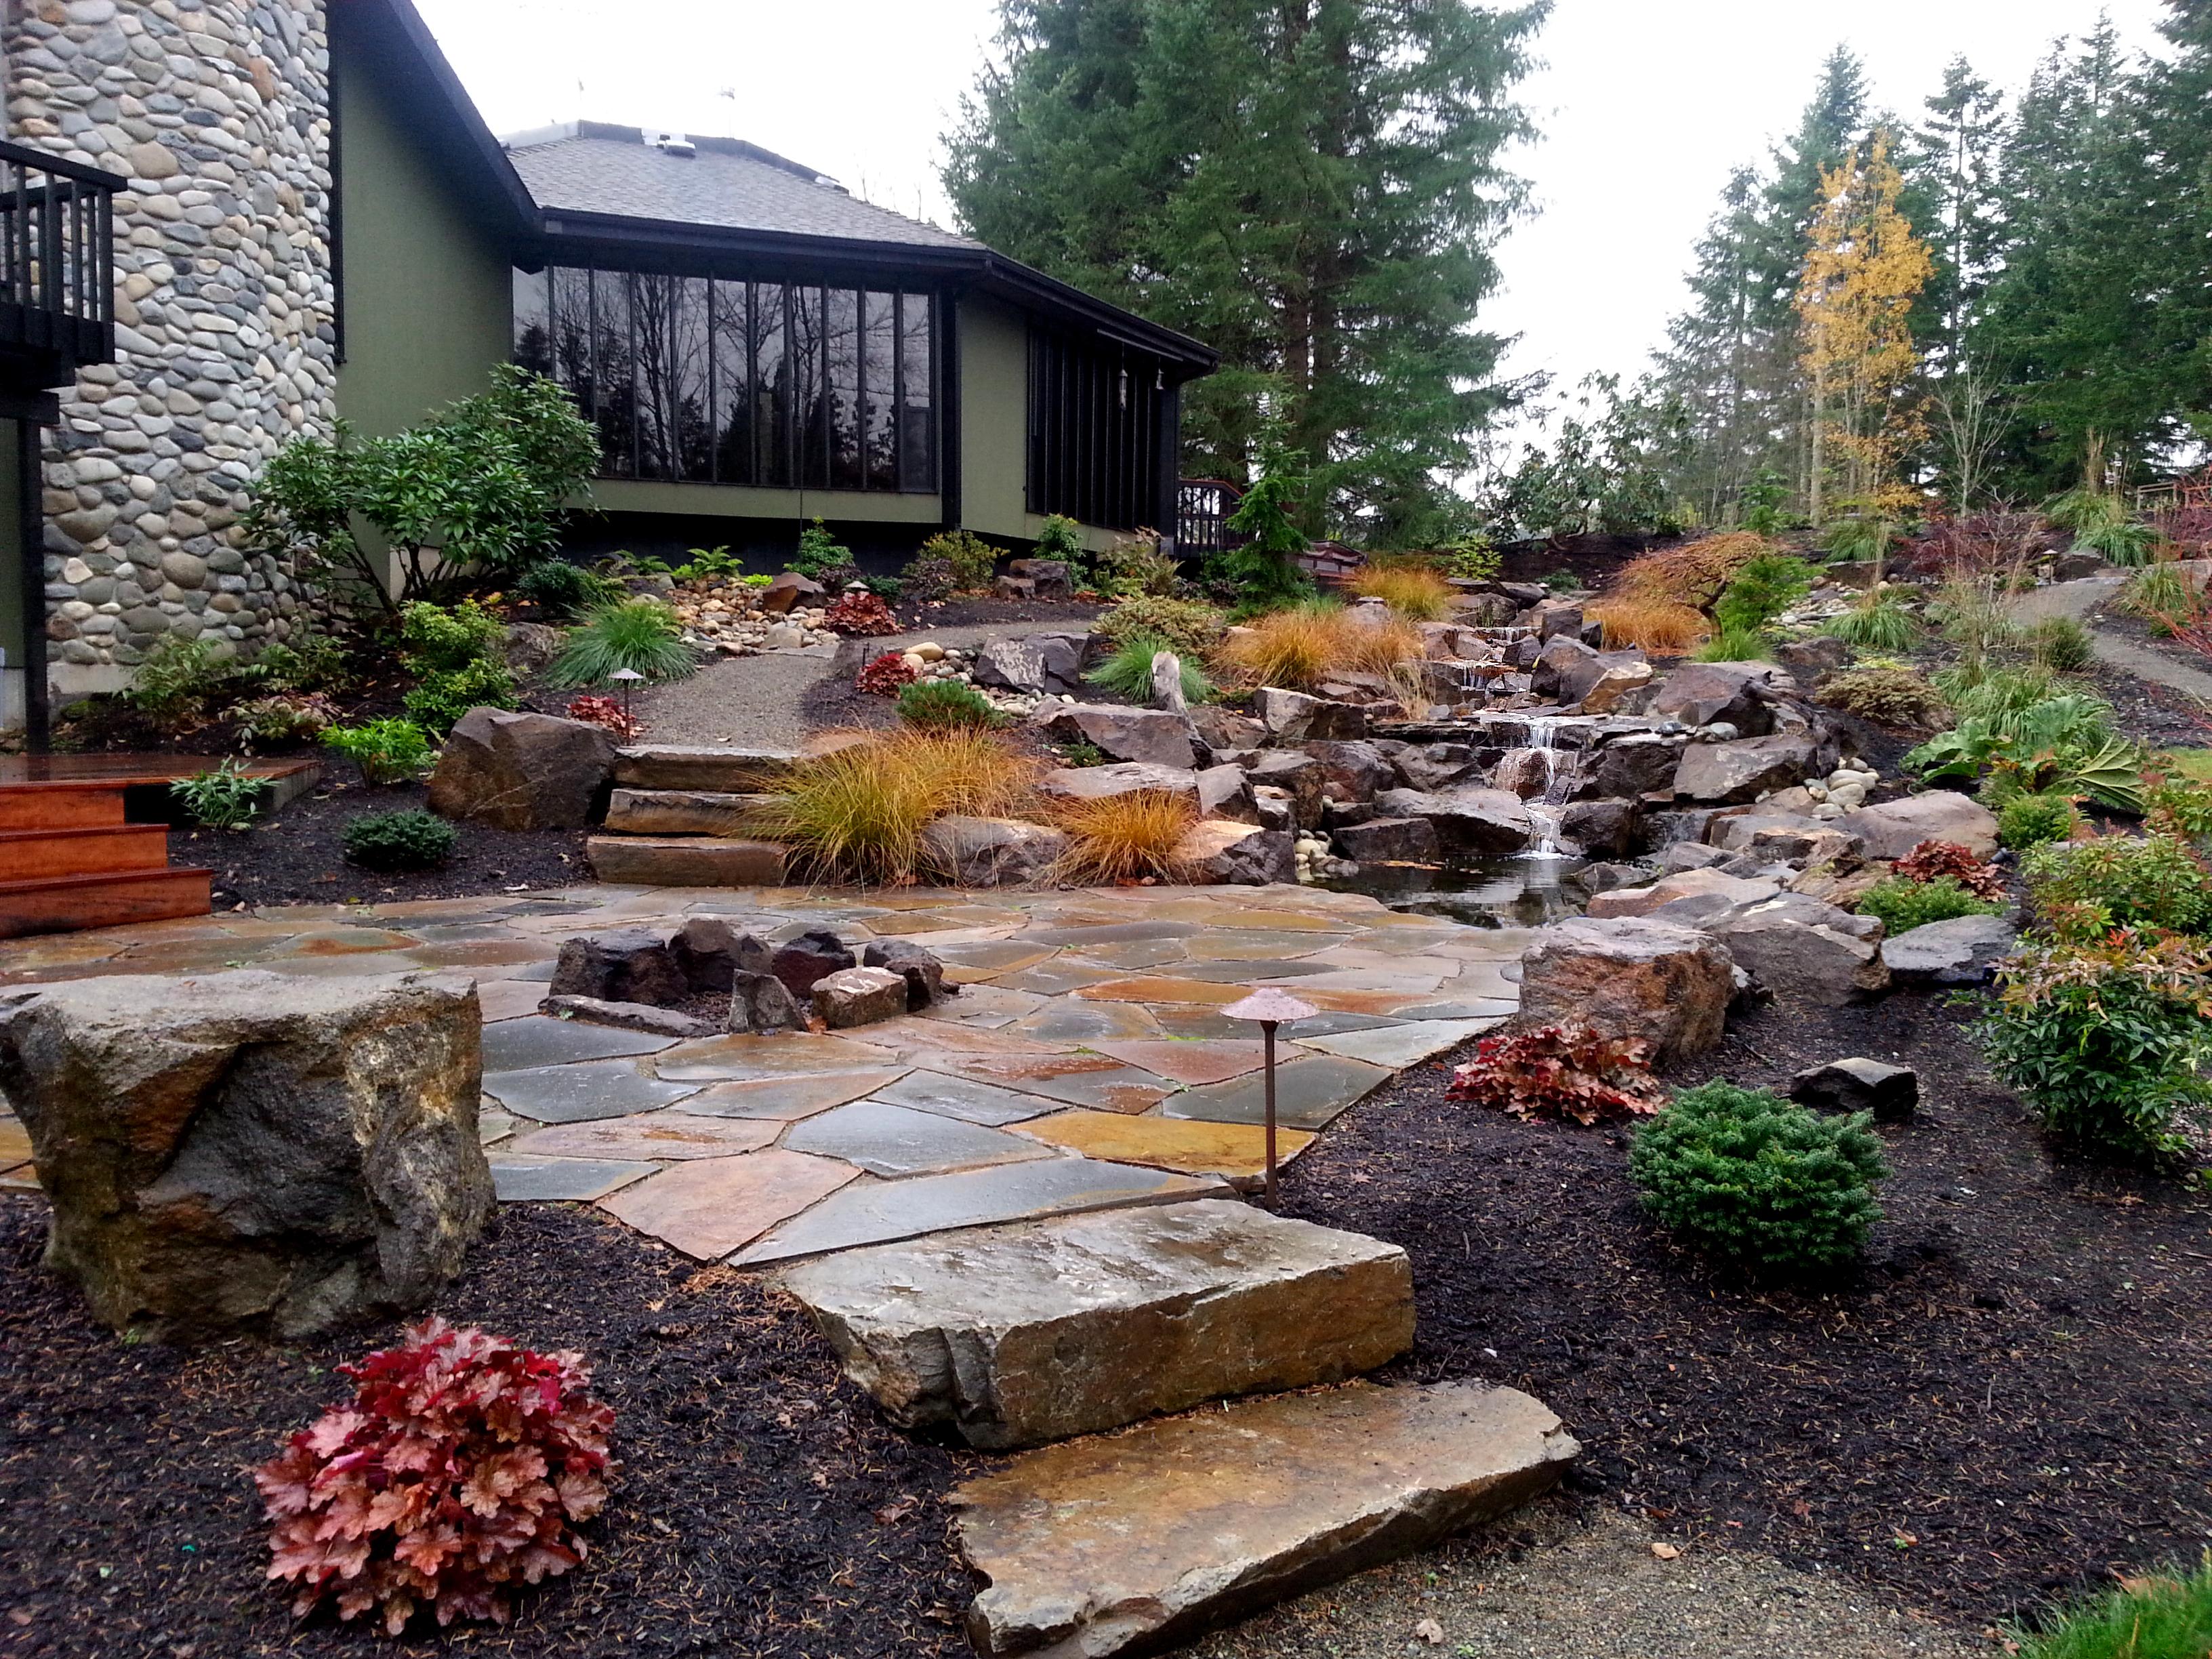 snohomish sandset montana flagstone patio - Flagstone Patio Designs